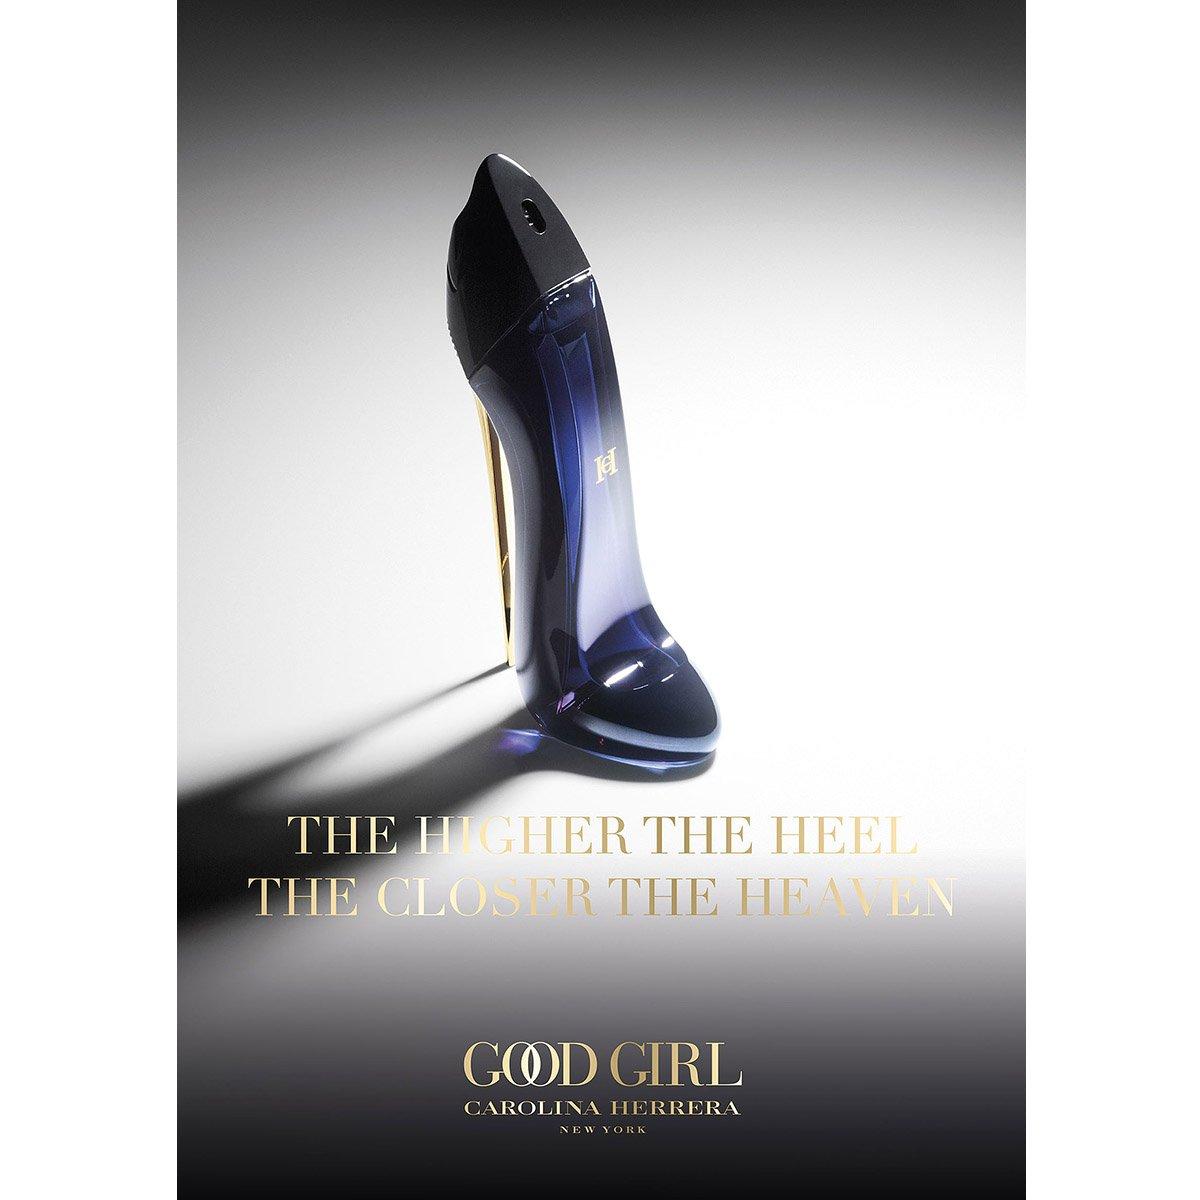 Perfume Feminino Good Girl Carolina Herrera Eau de Parfum 50ml - 3